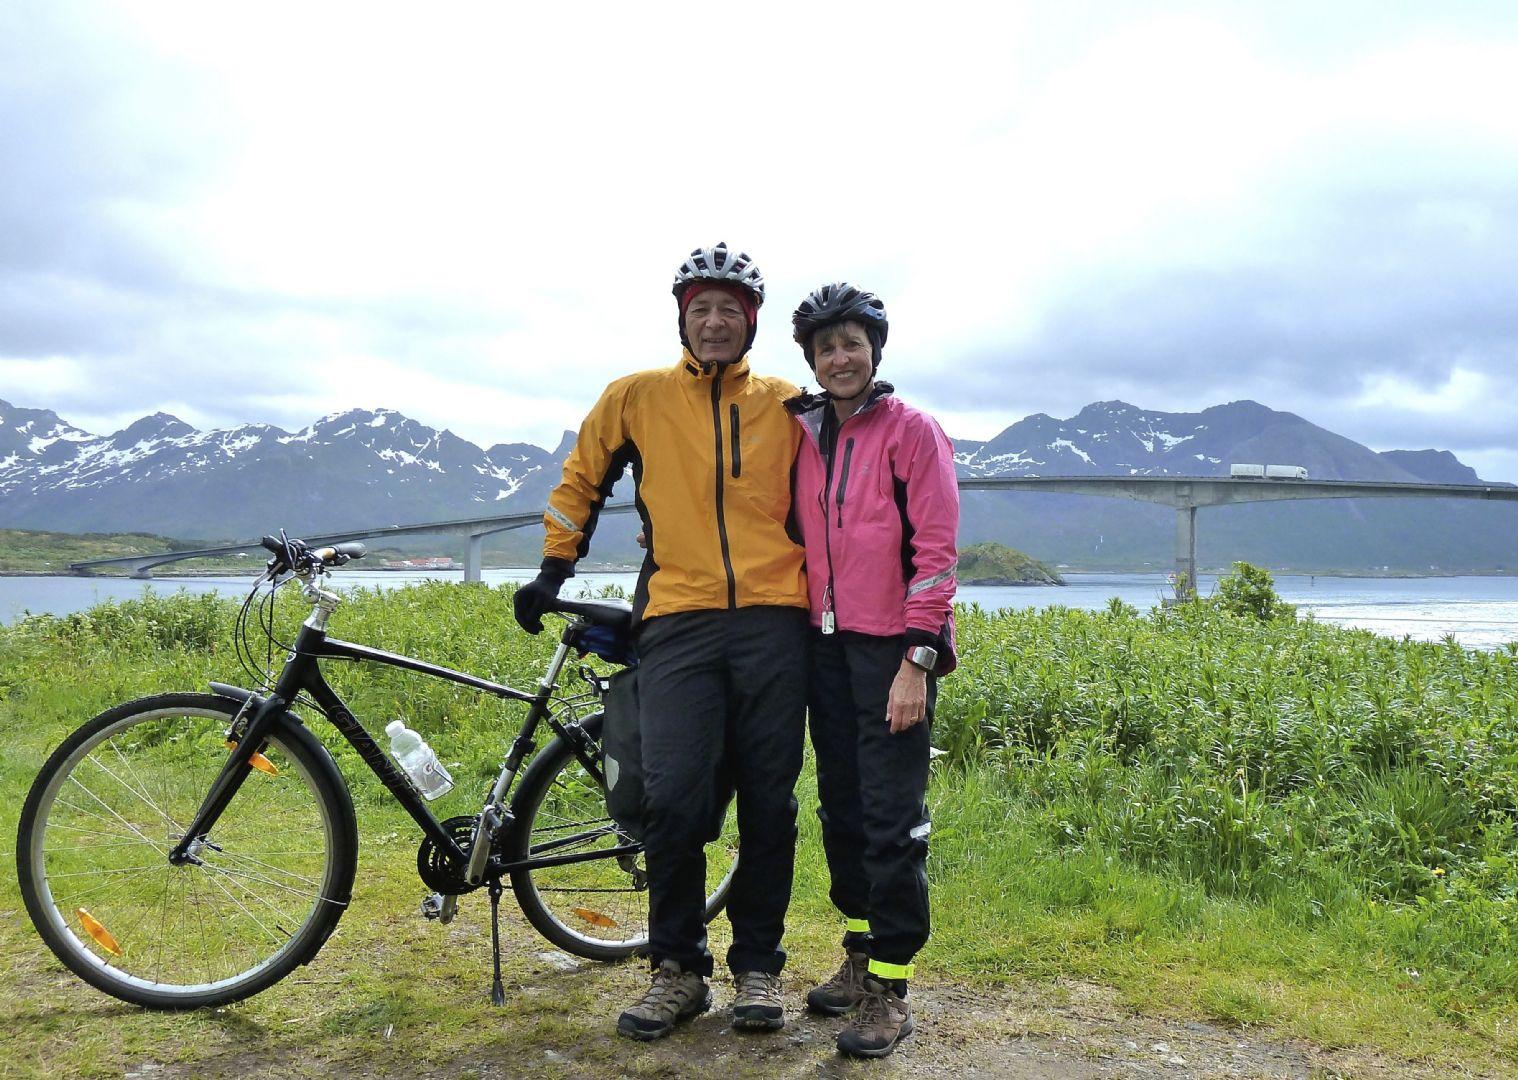 _Customer.103820.17307.jpg - Norway - Lofoten Islands - Self-Guided Leisure Cycling Holiday - Leisure Cycling